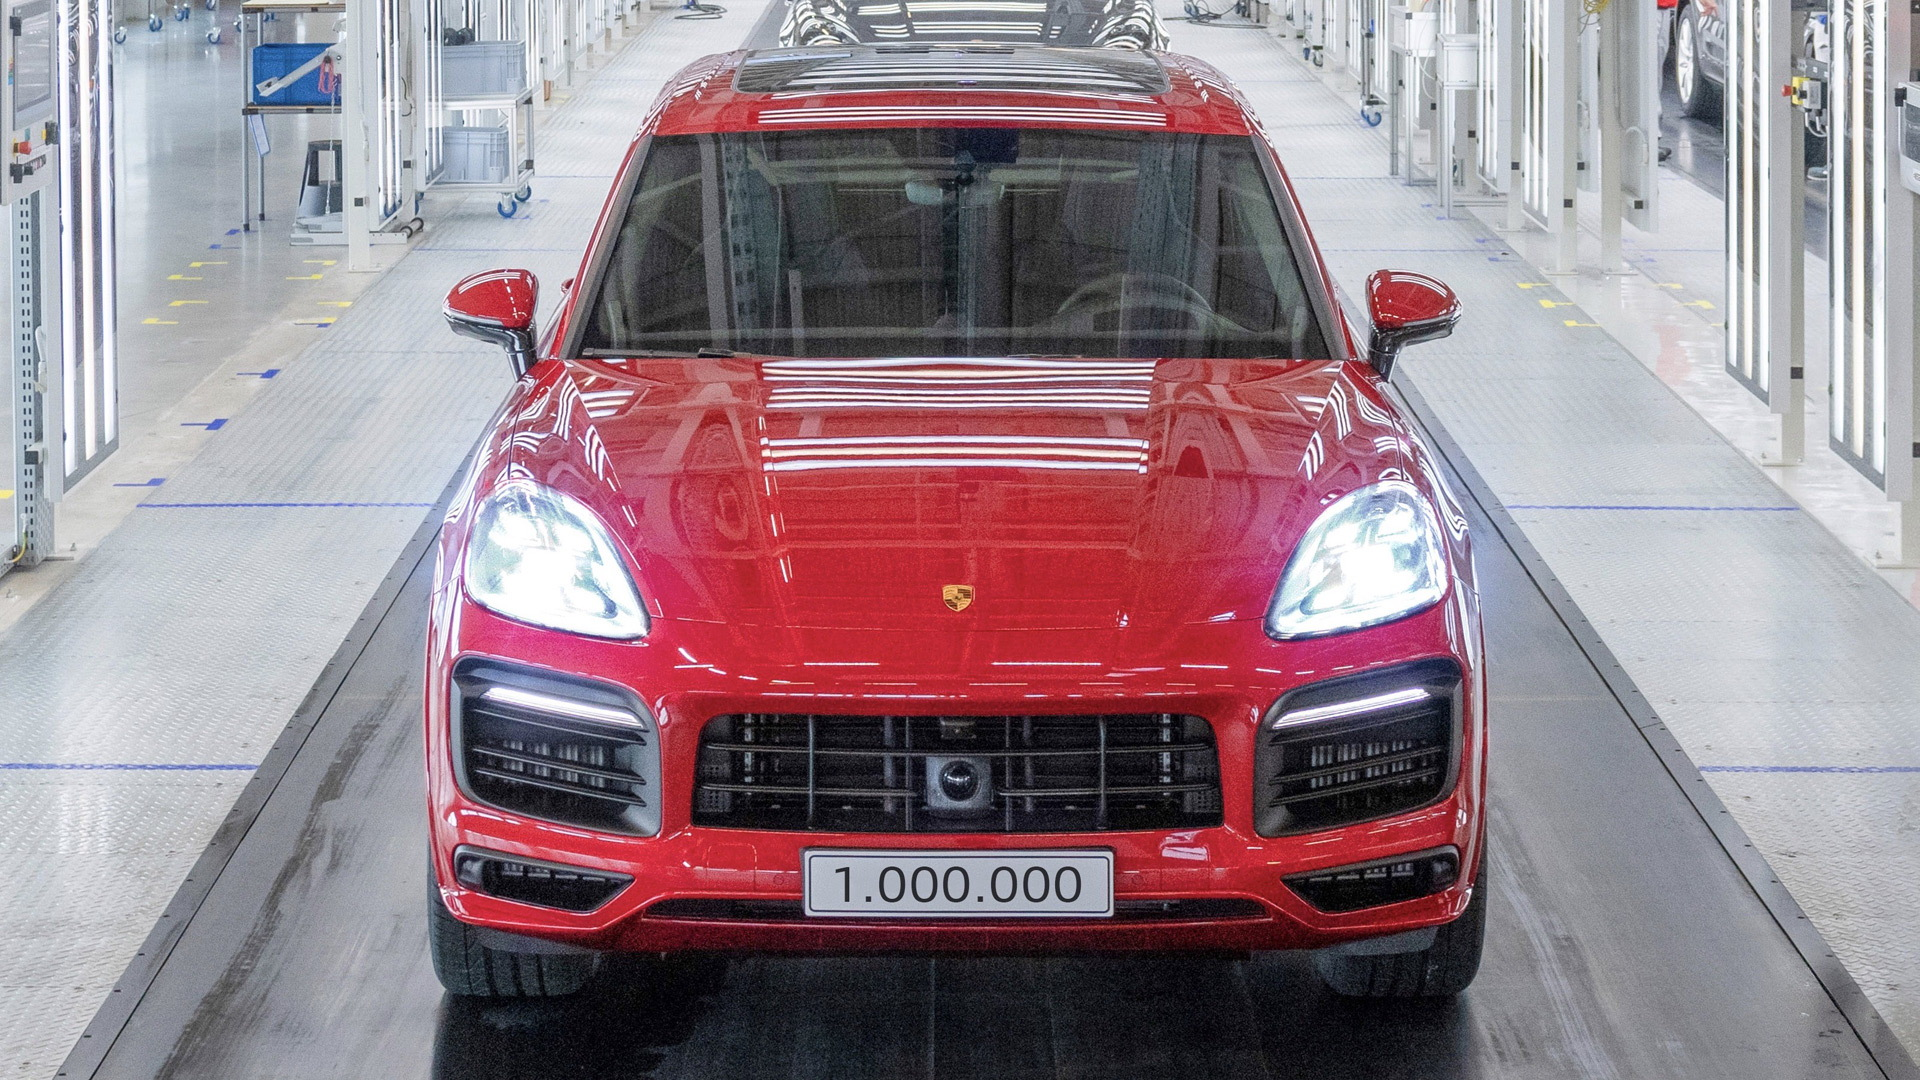 Porsche builds its 1,000,000th Cayenne - December 2020